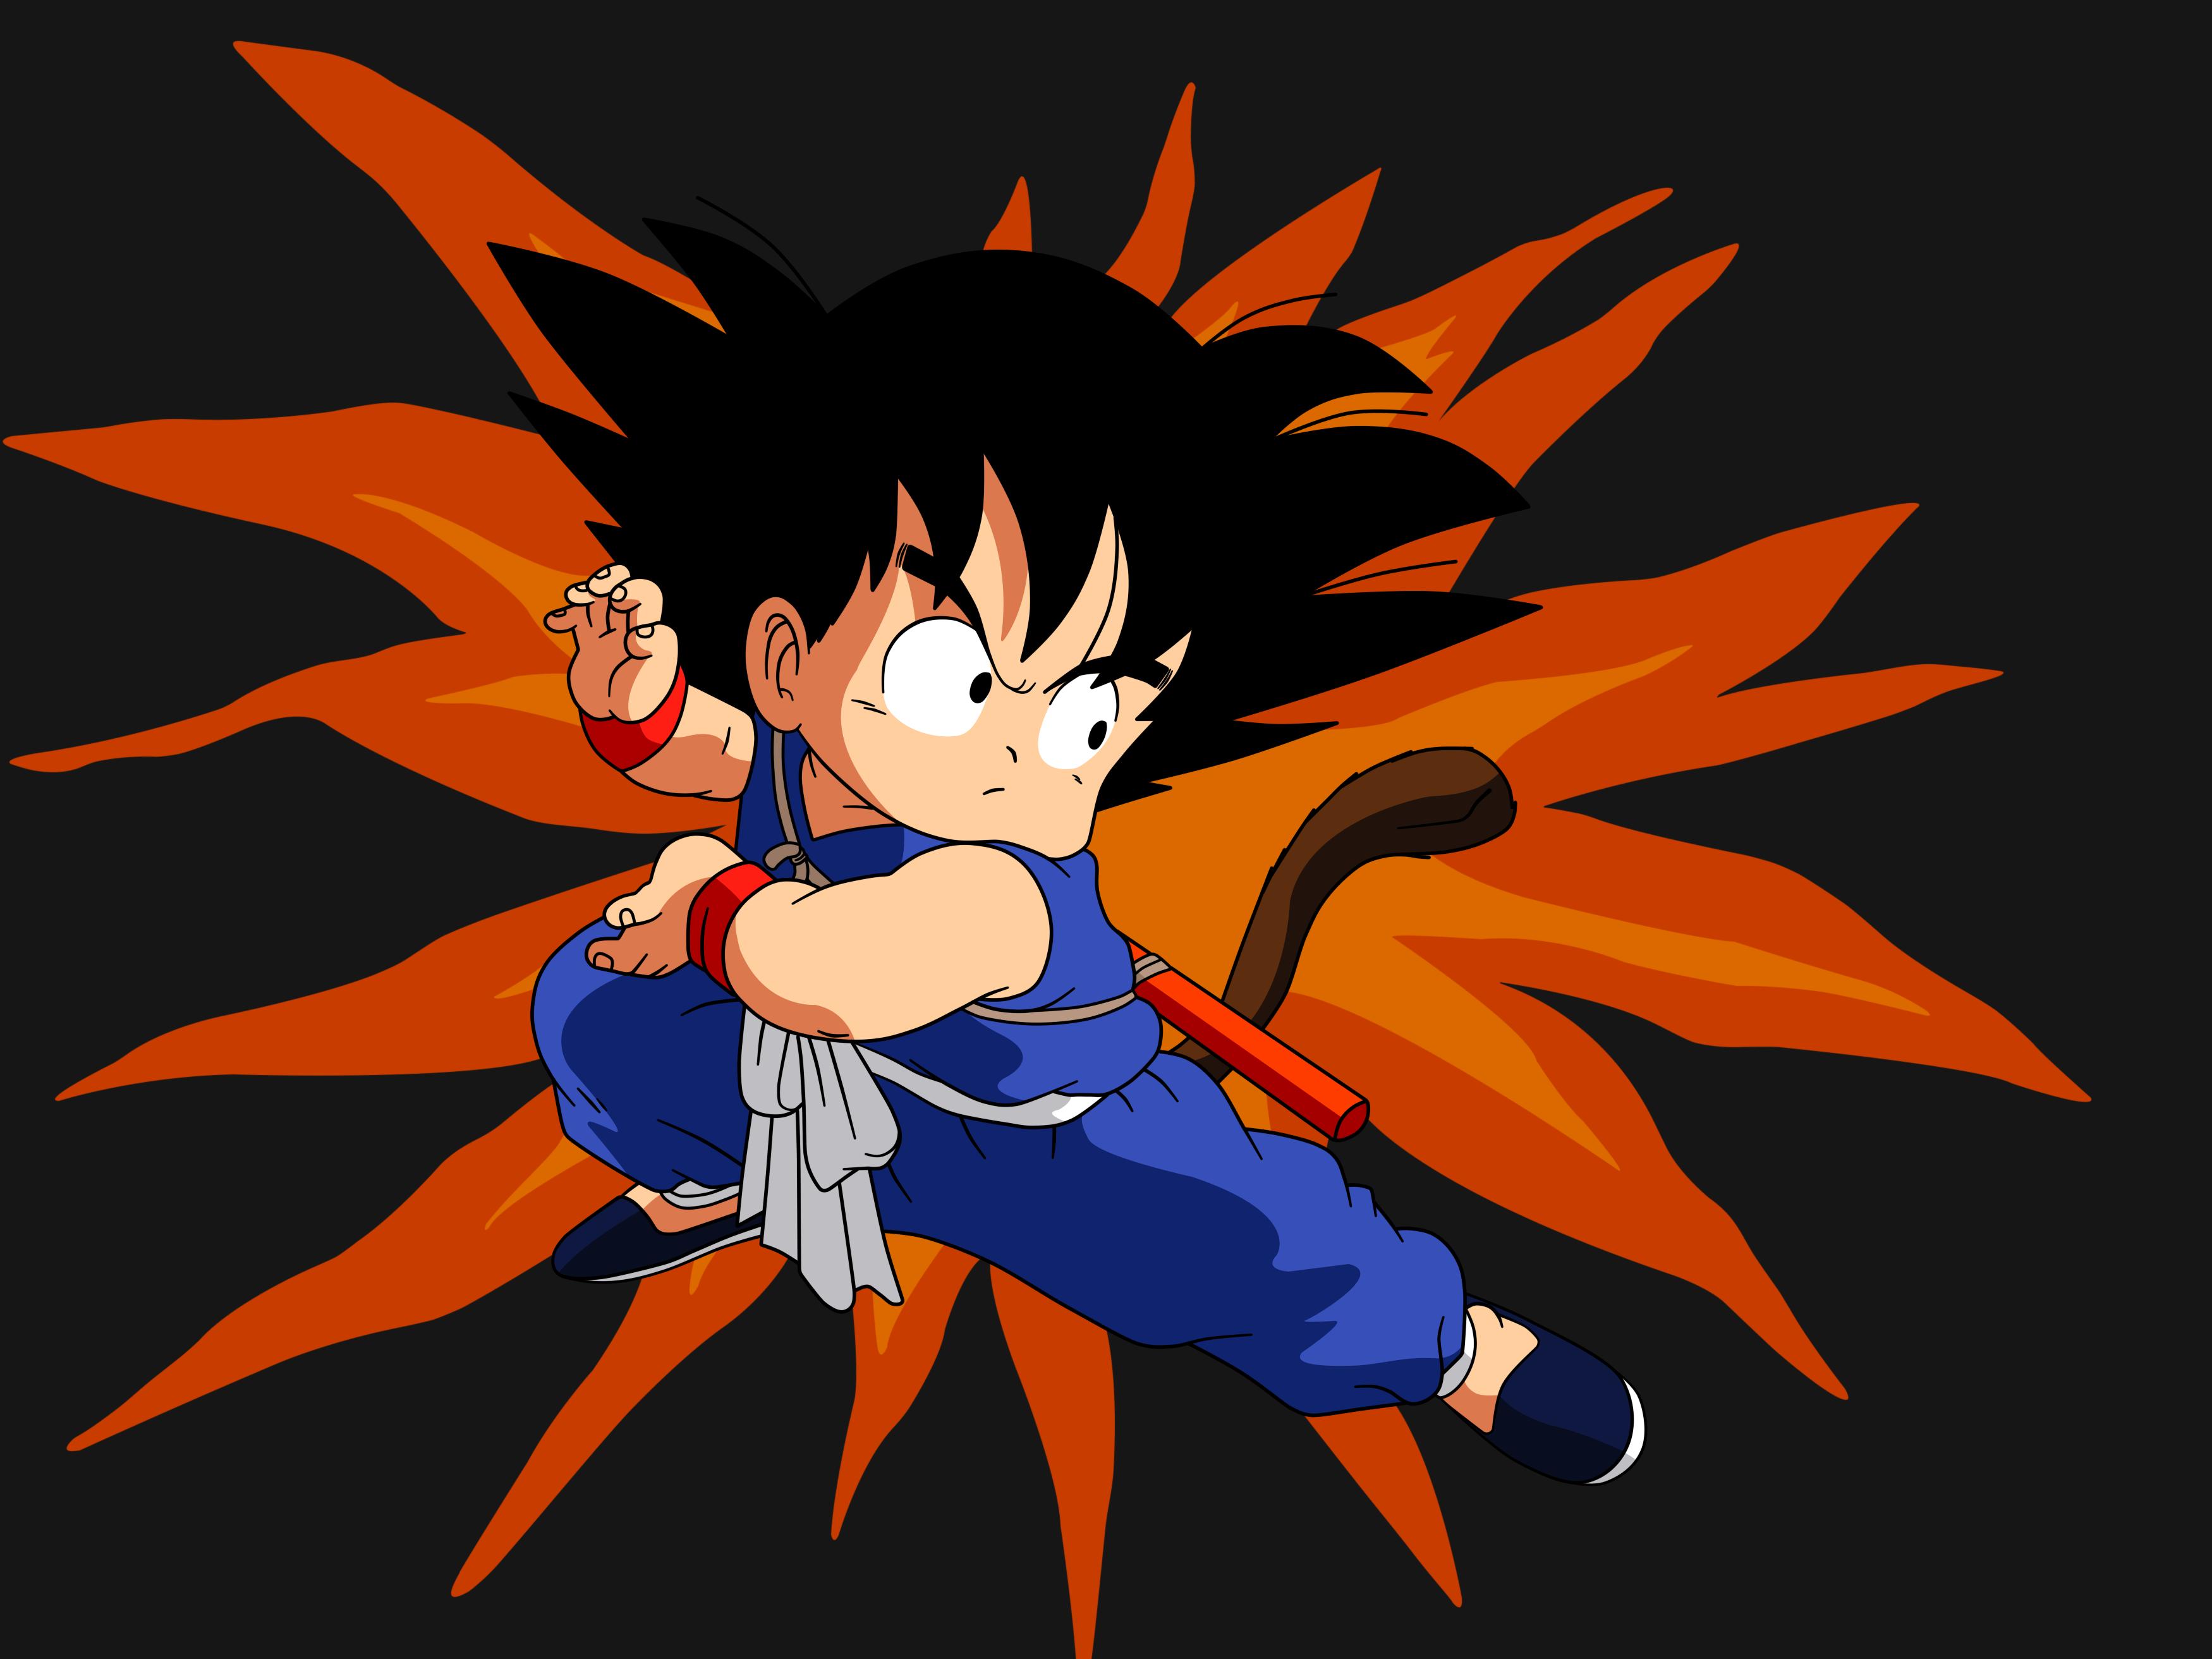 dragon_ball___kid_goku_24_by_superjmanpl